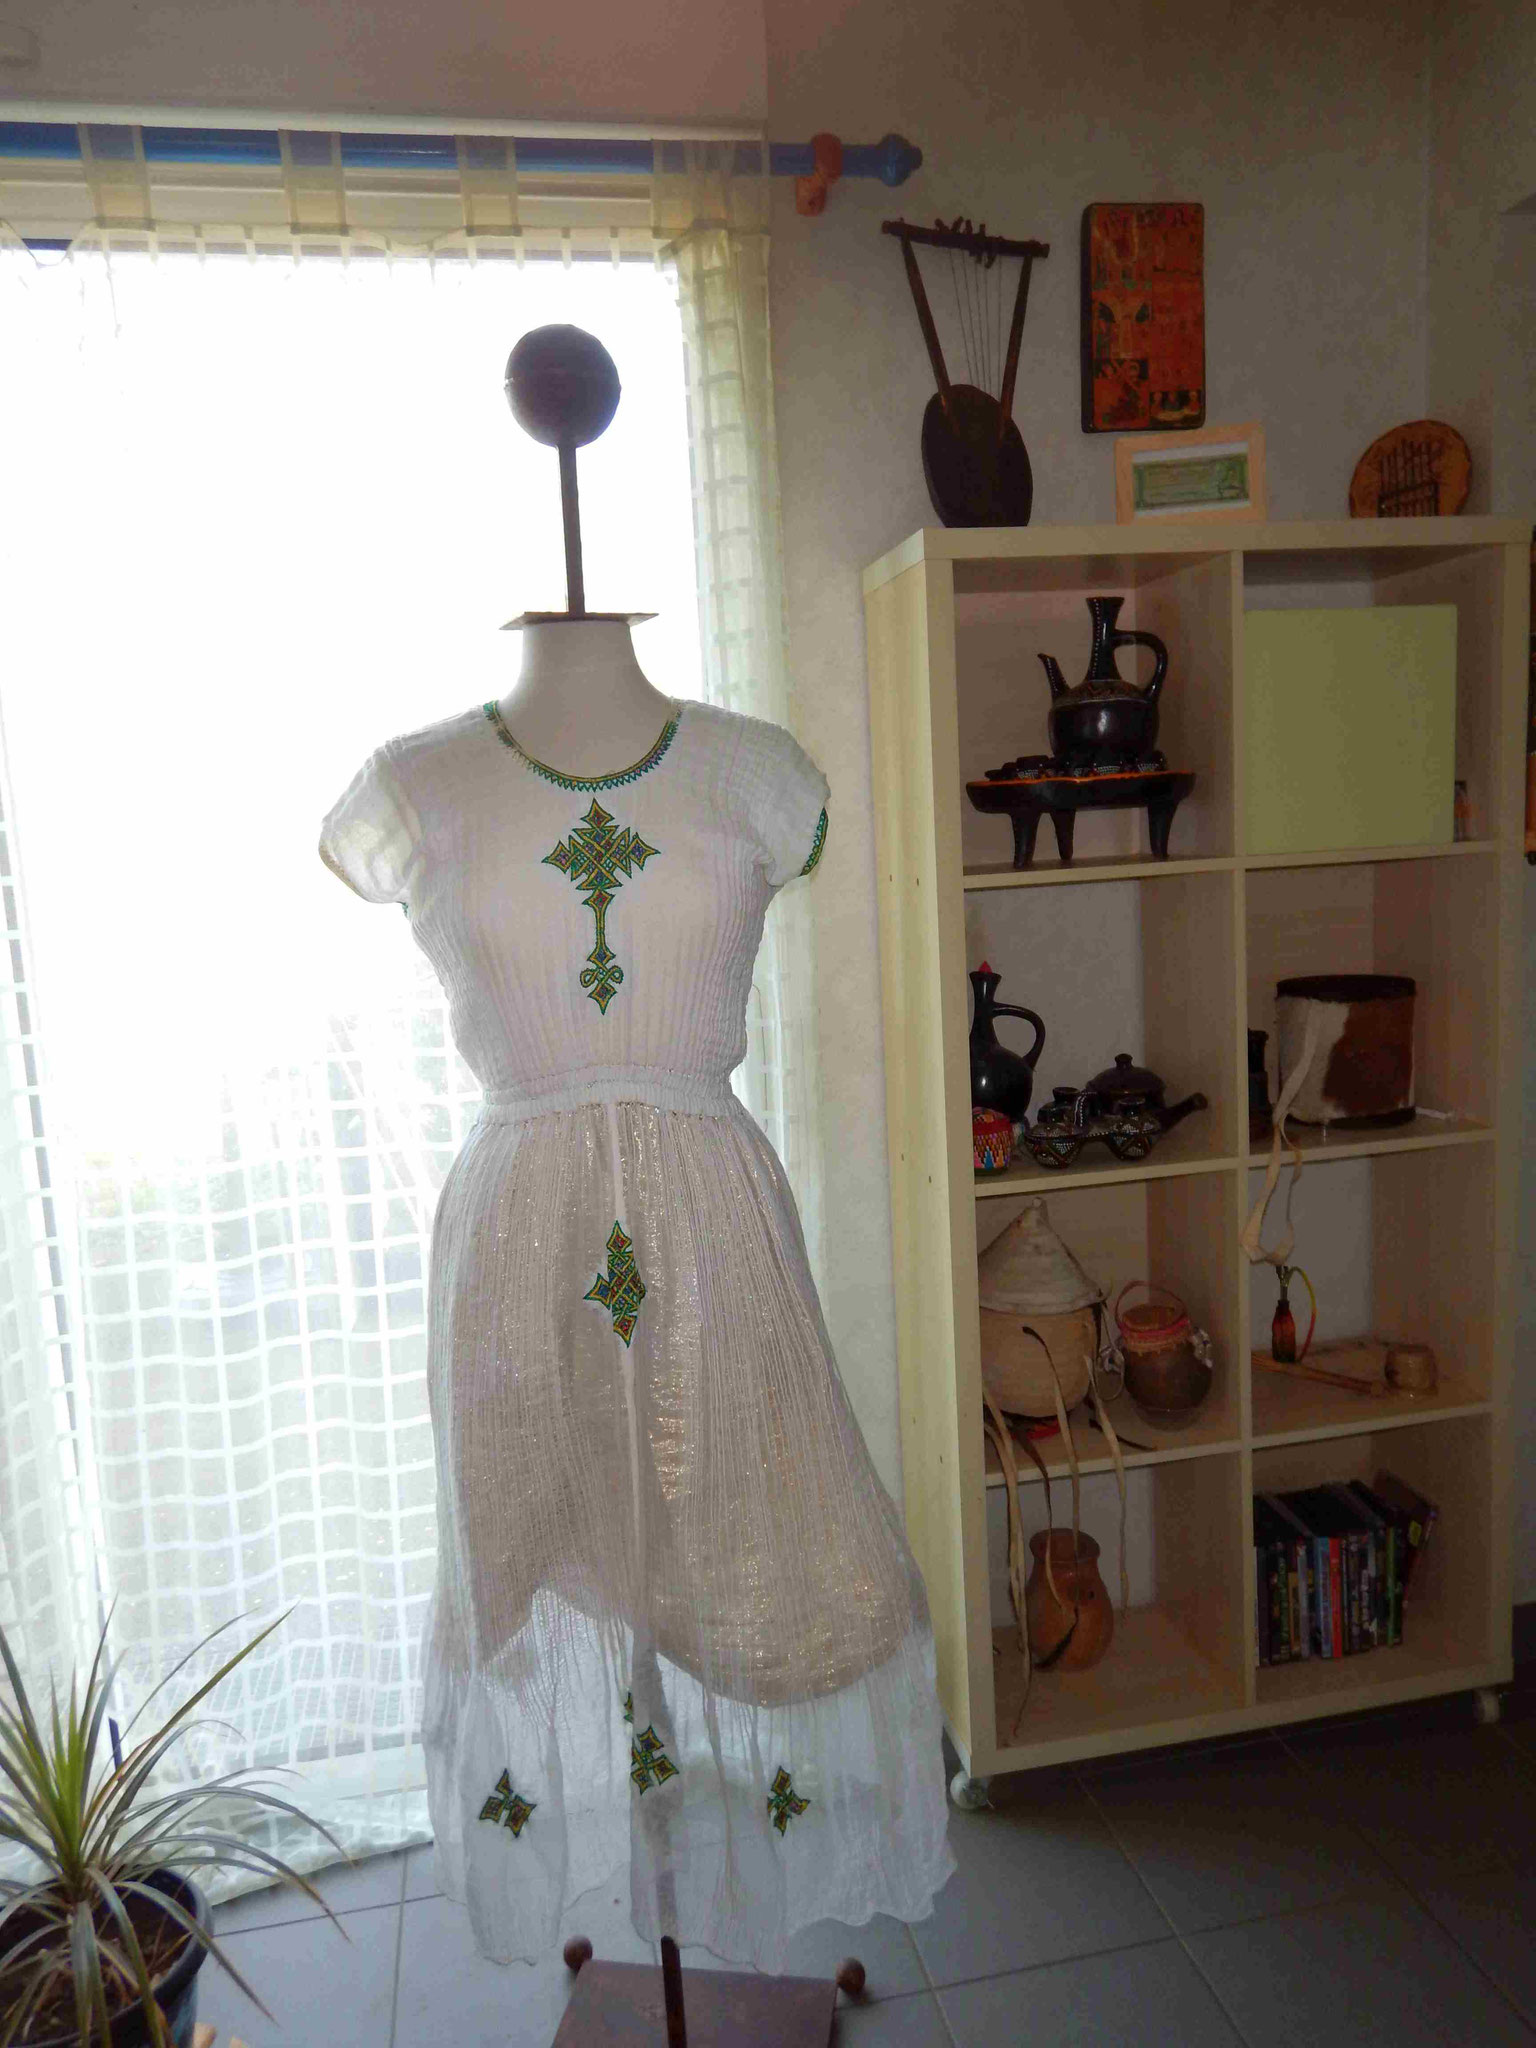 Robe Habesha Coton Ethiopie Artisanat ethiopien Epices made by locals solidaire équitable textils voyage Ethiopie 1